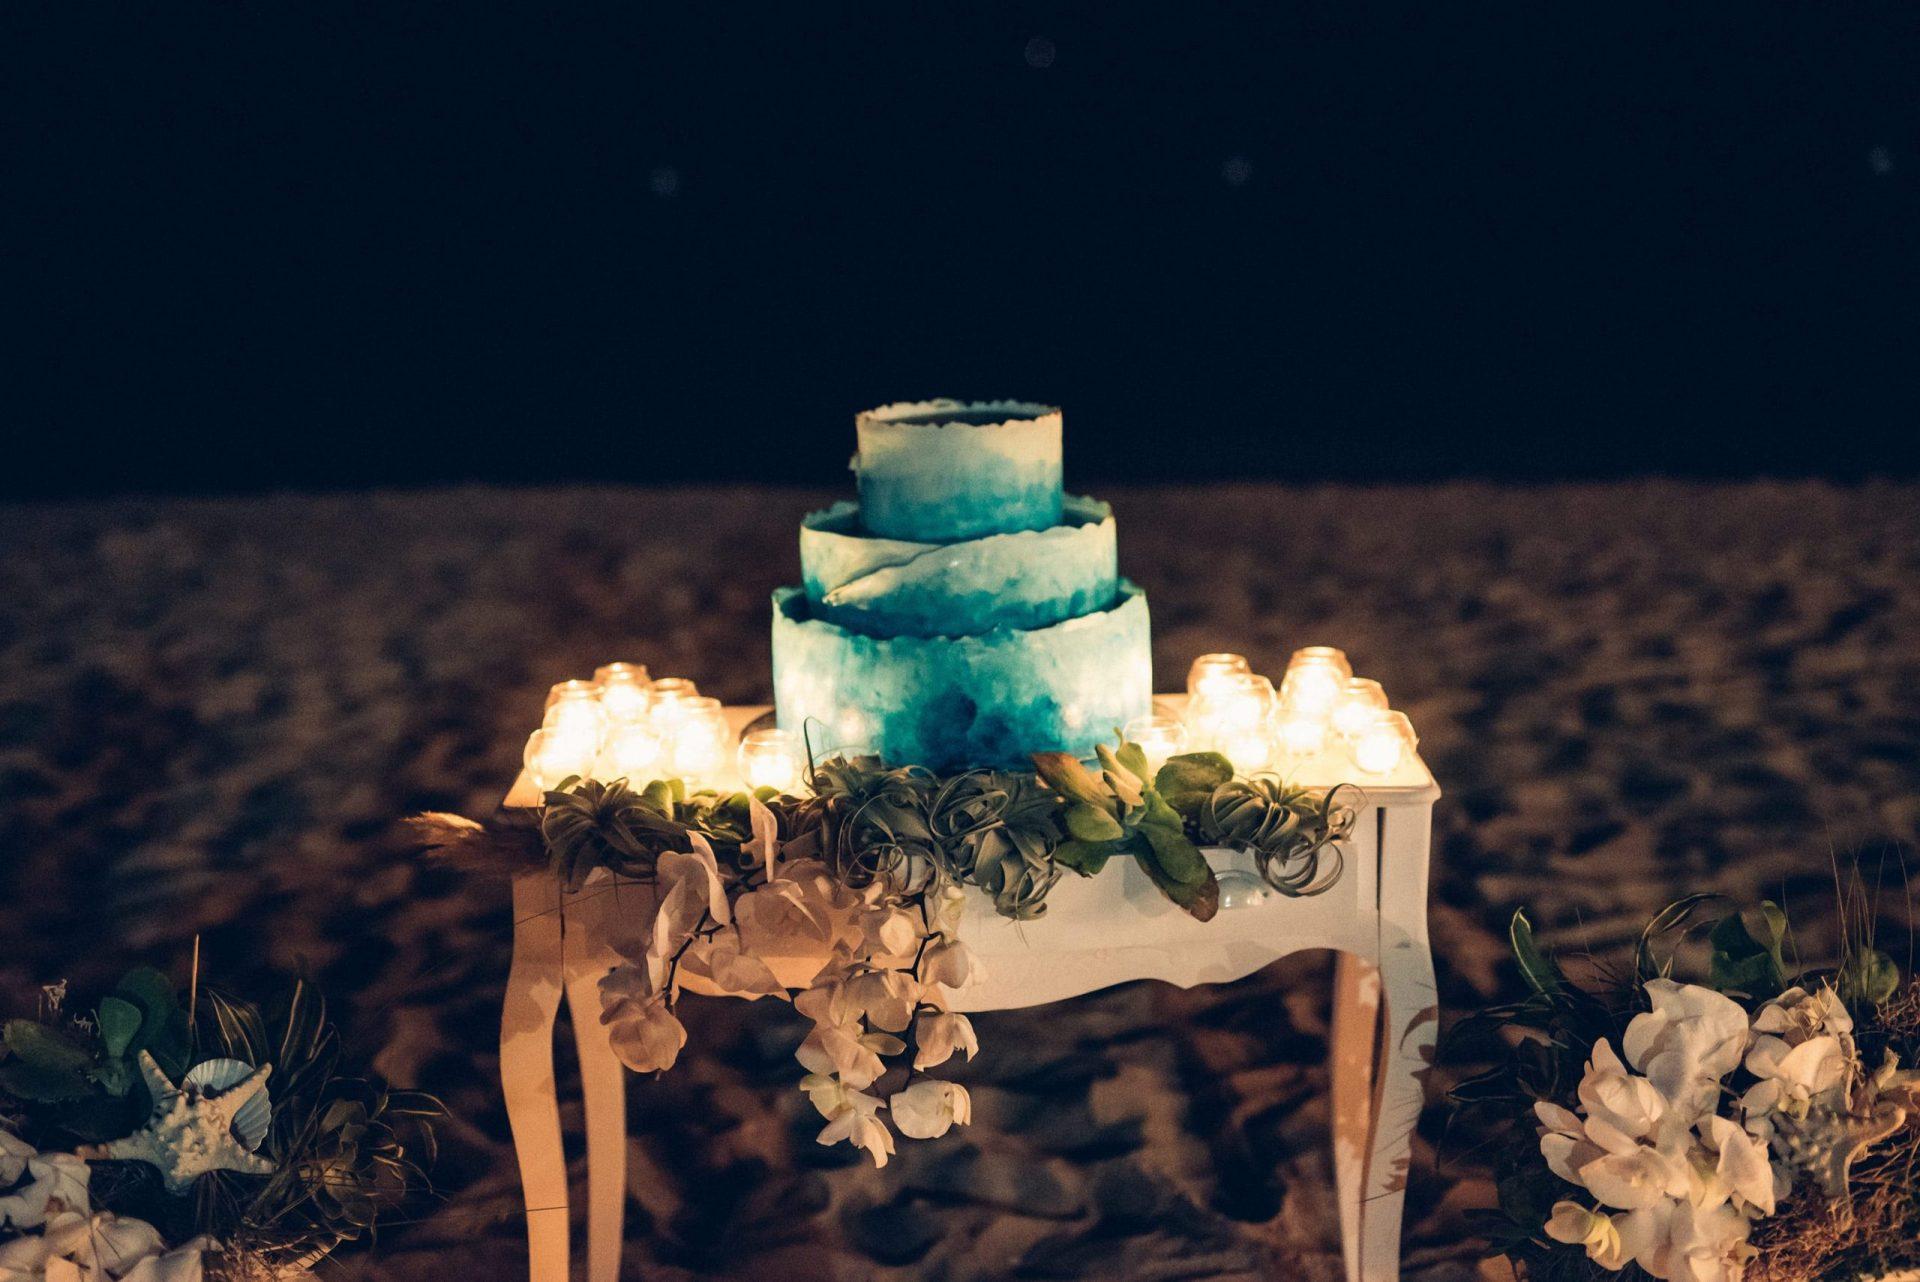 Mario and Mery, beach wedding cake table